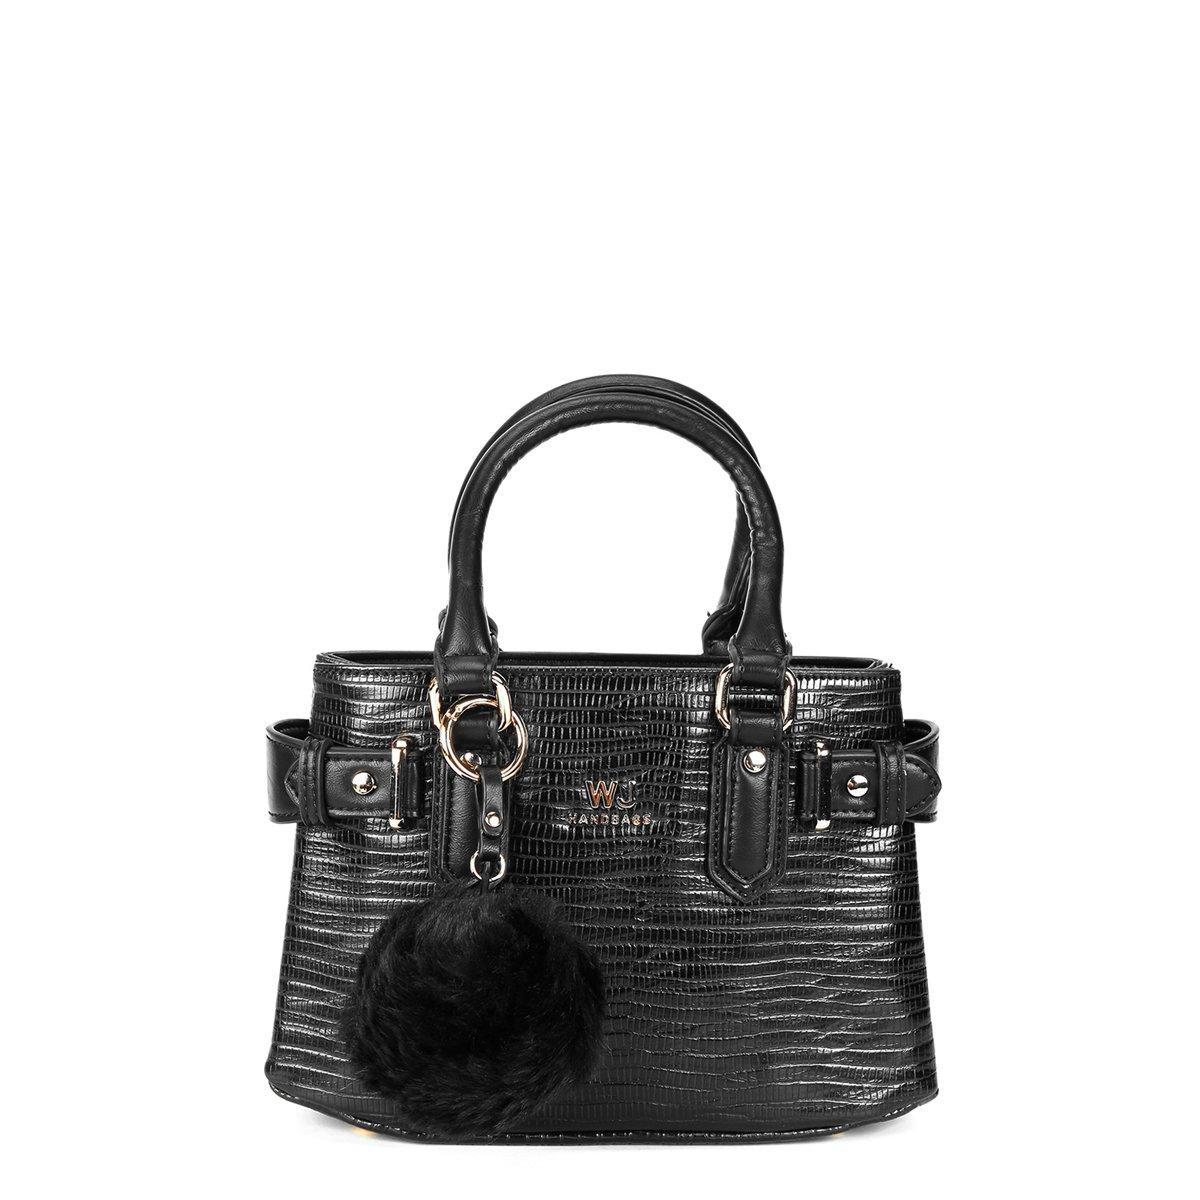 218f1d0de Bolsa WJ Mini Bag Pompom Feminina - Compre Agora | Zattini